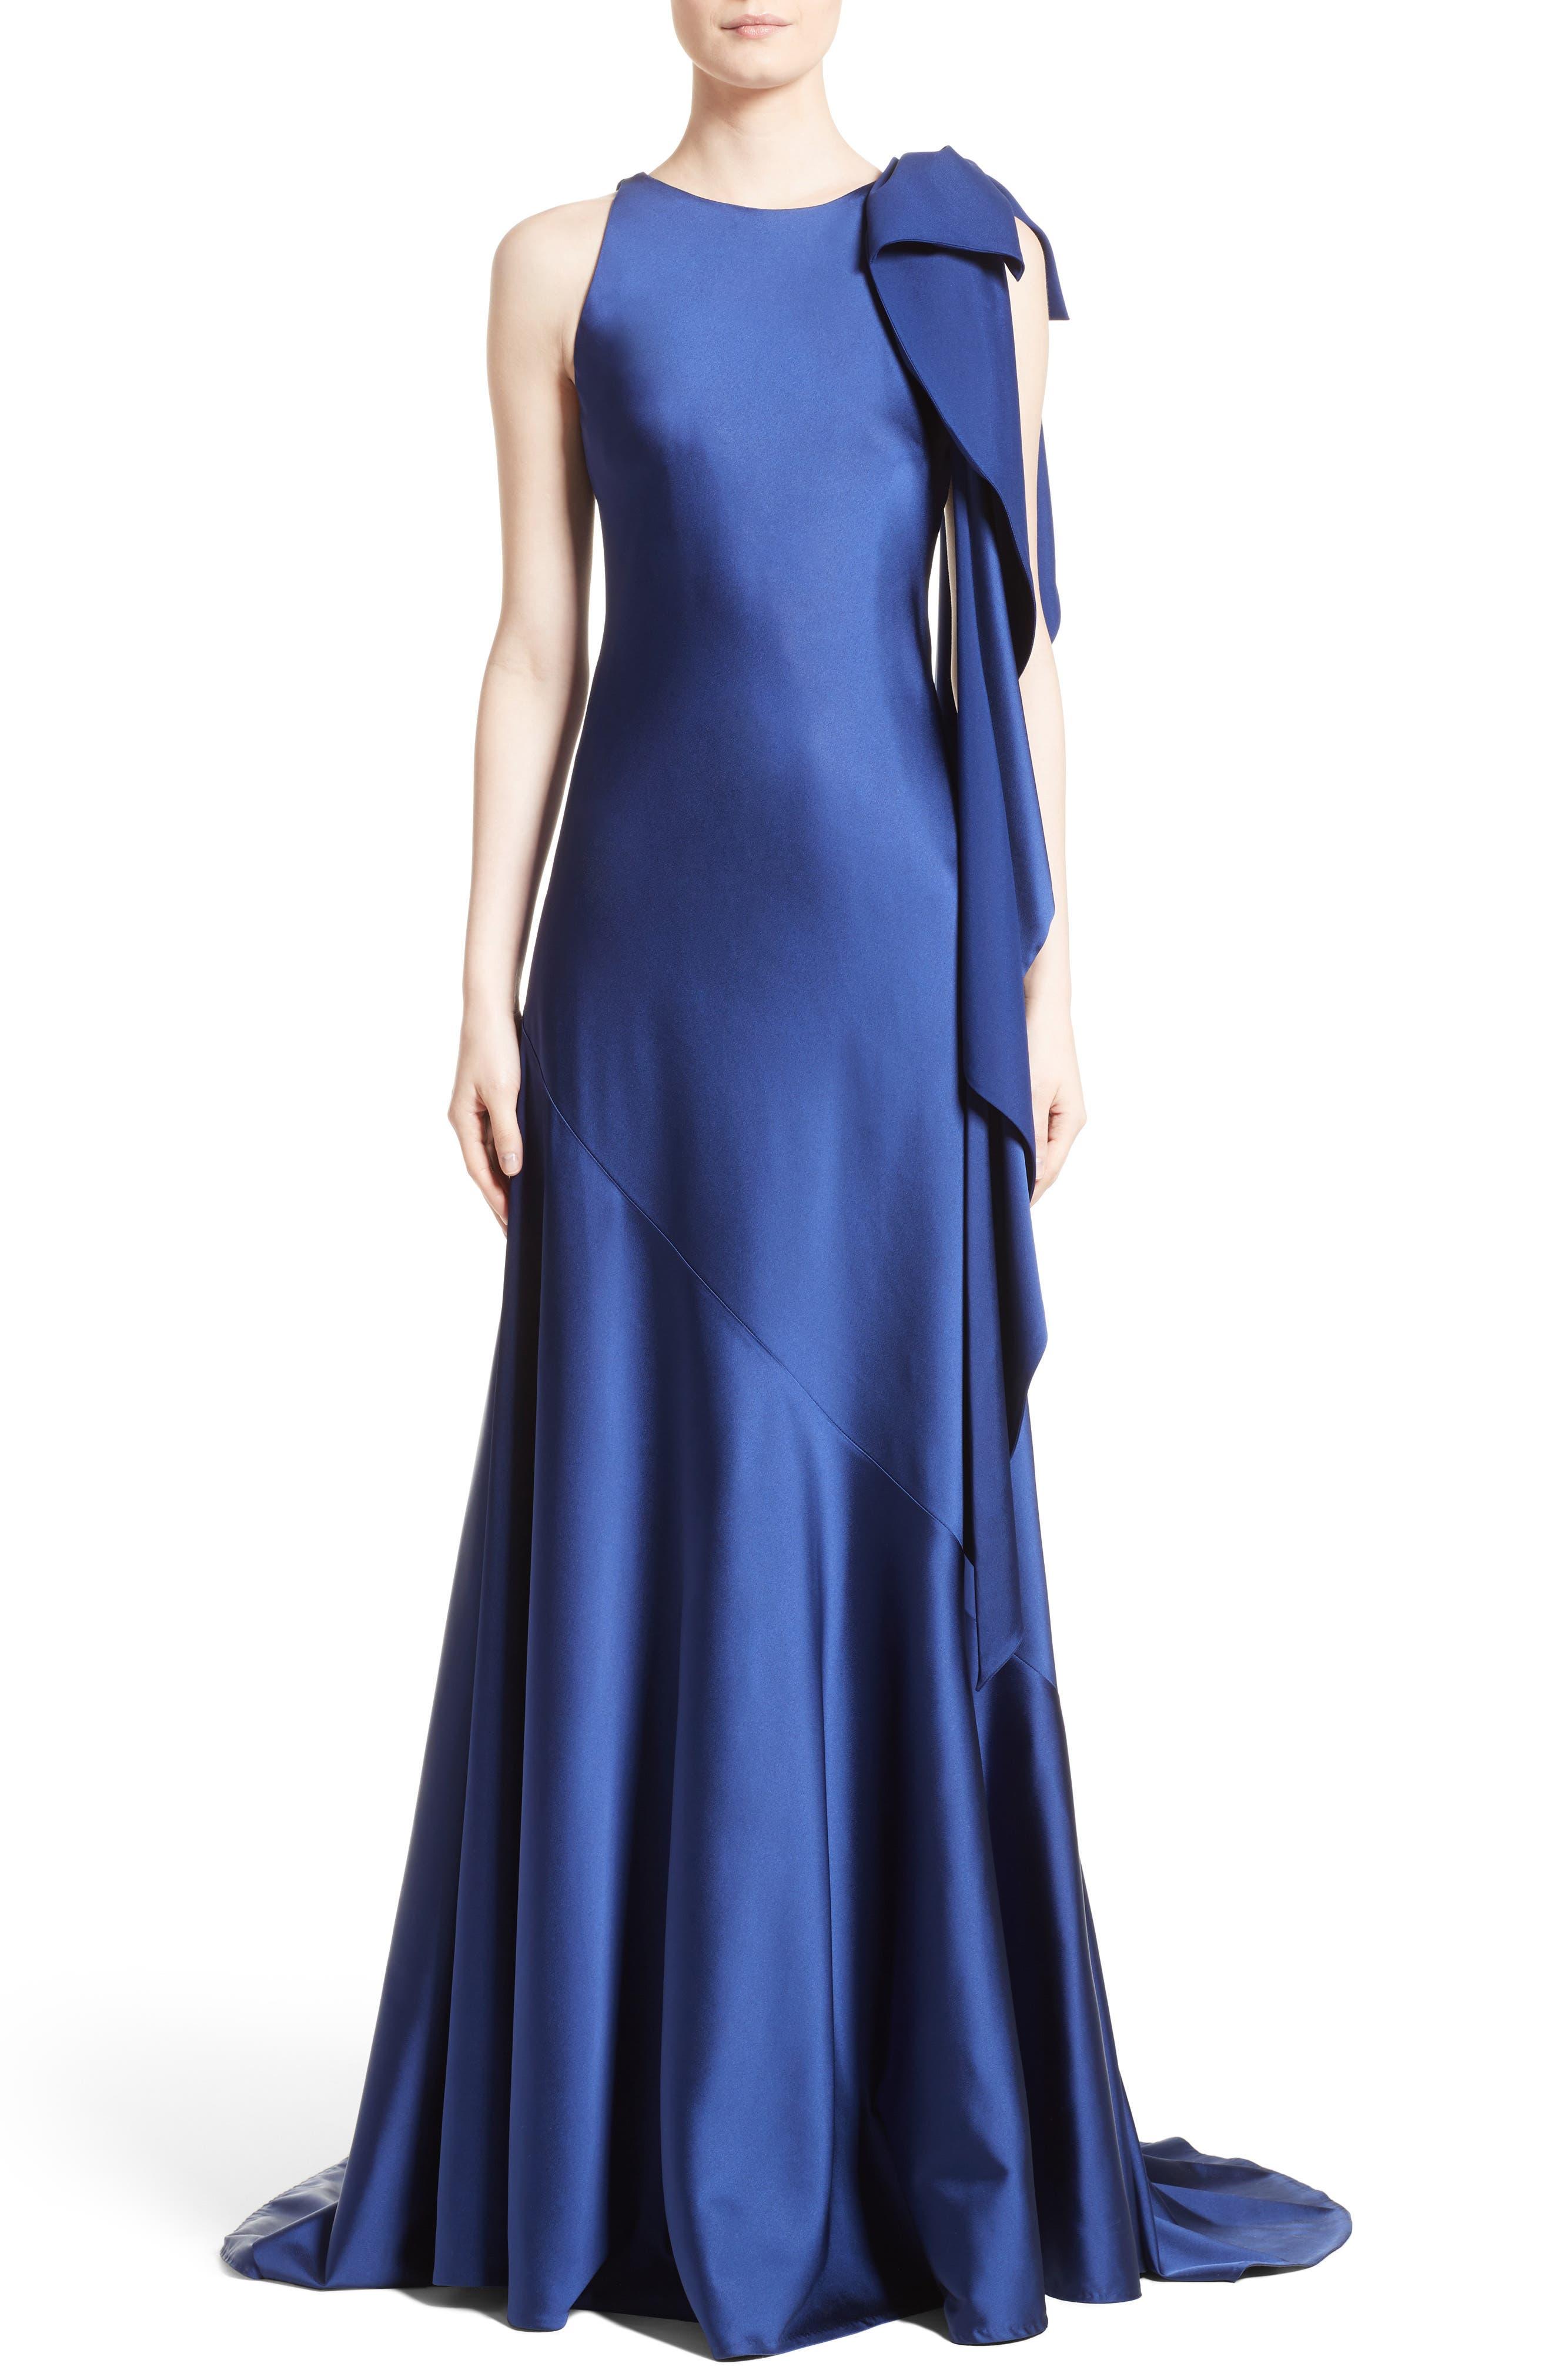 Alternate Image 1 Selected - Talbot Runhof Bow Detail Crepe Satin Gown